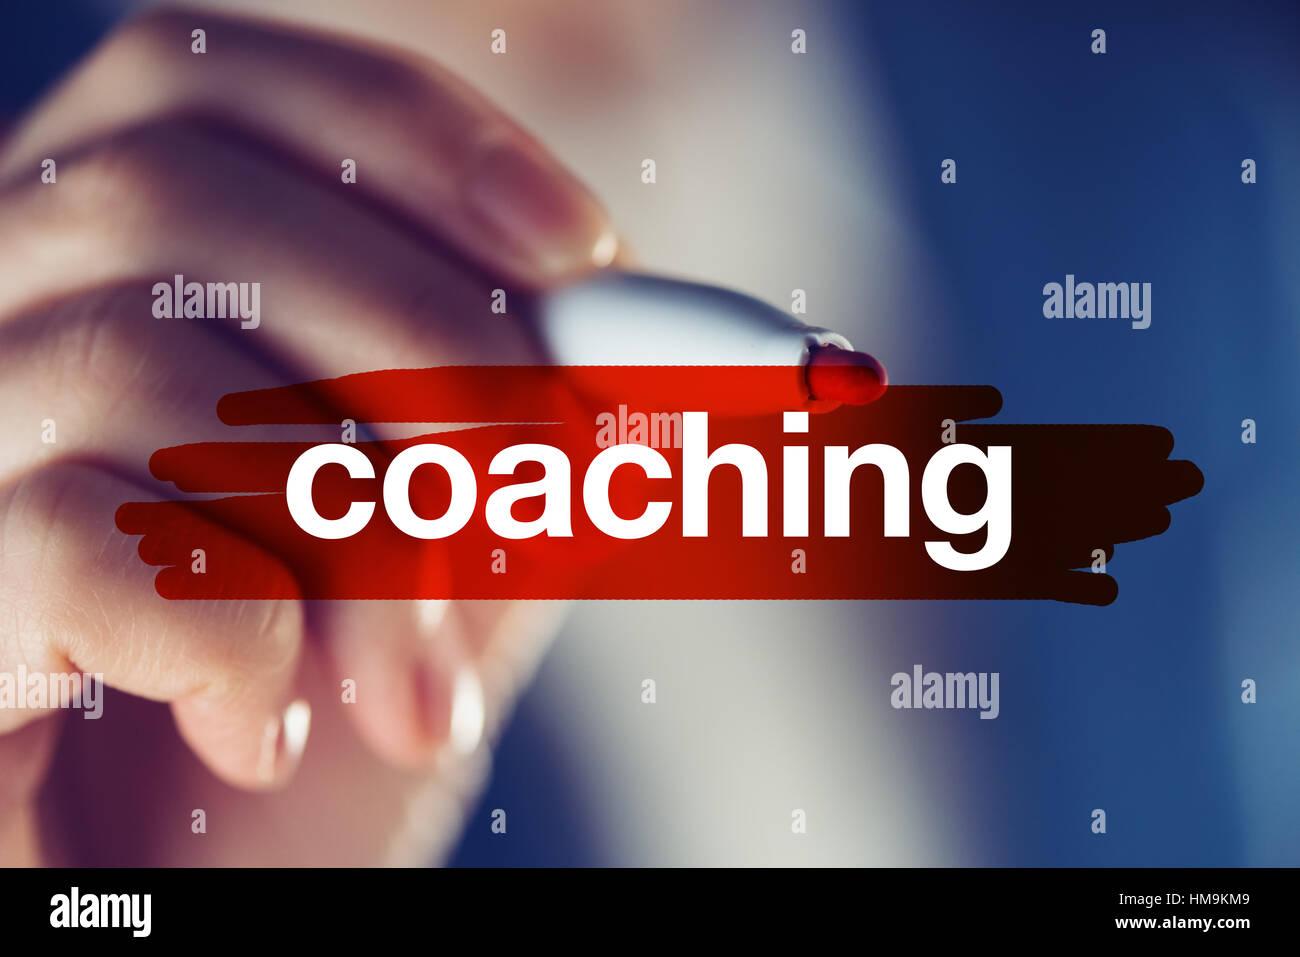 El coaching empresarial concepto, empresaria destacando plazo con rotulador rojo Imagen De Stock